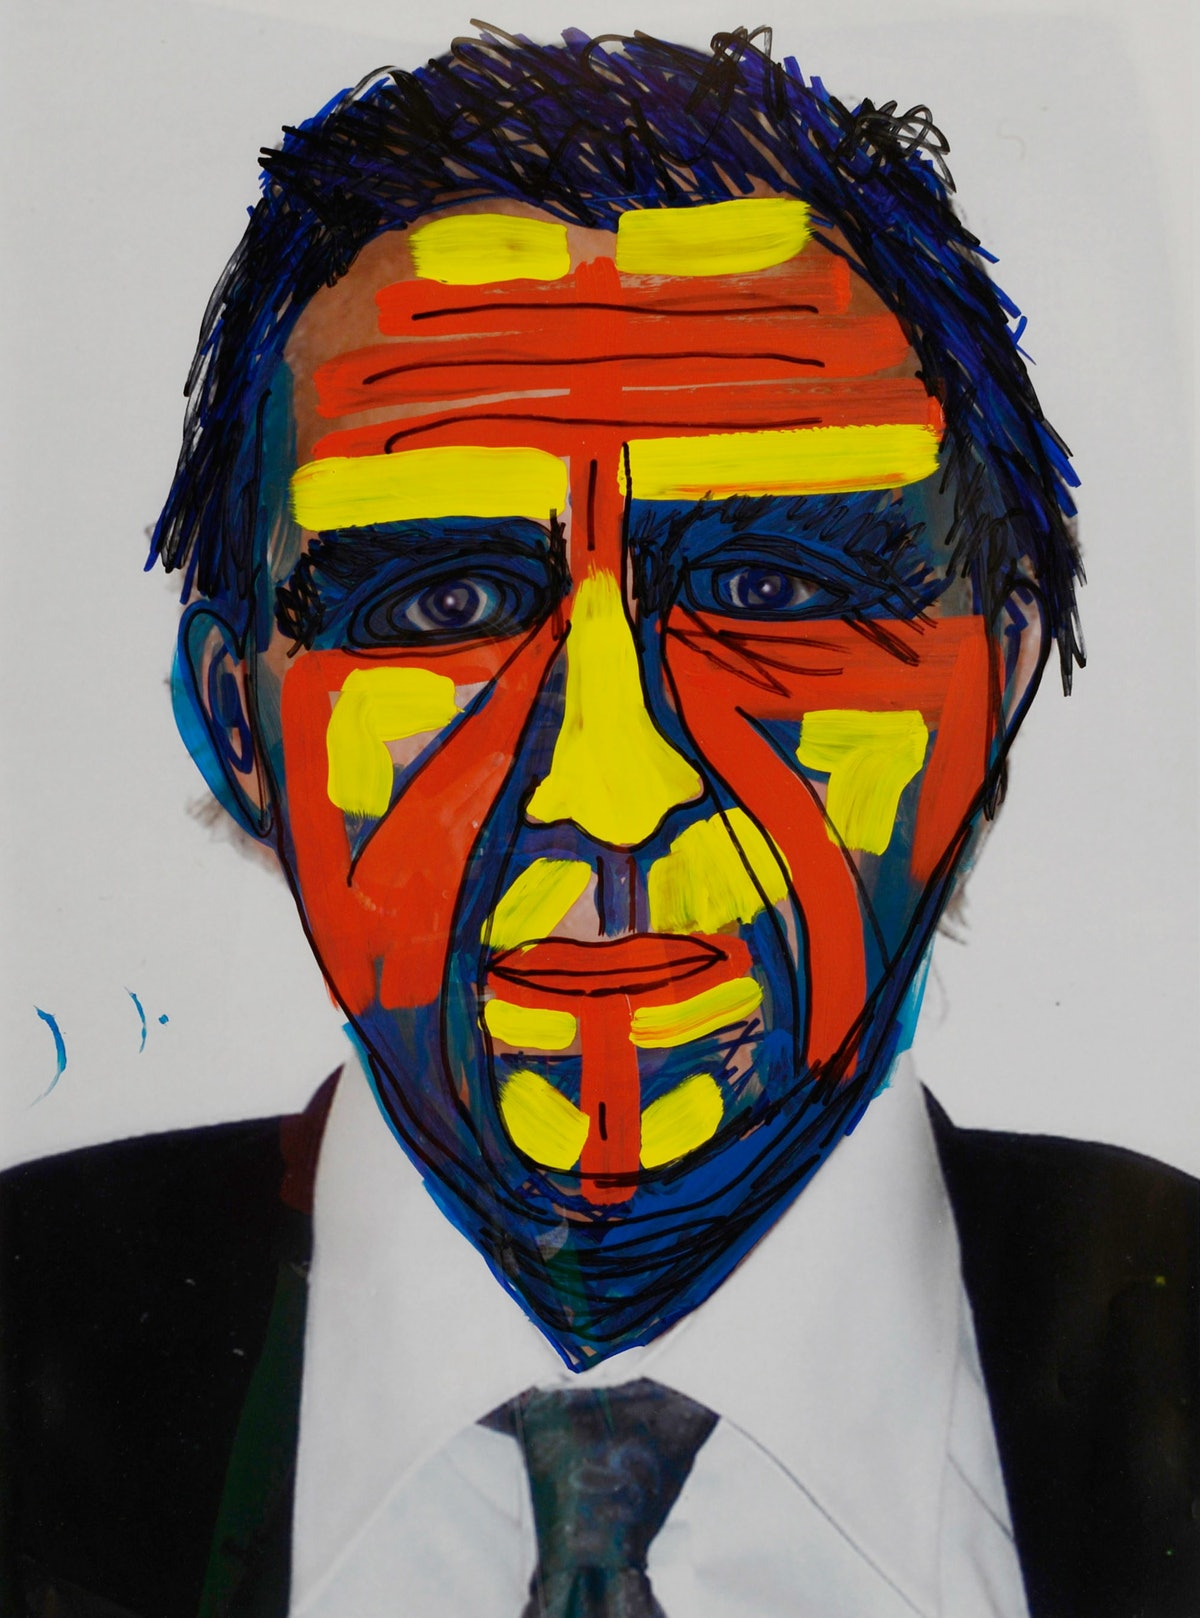 Jimmie Durham's Self-Portrait